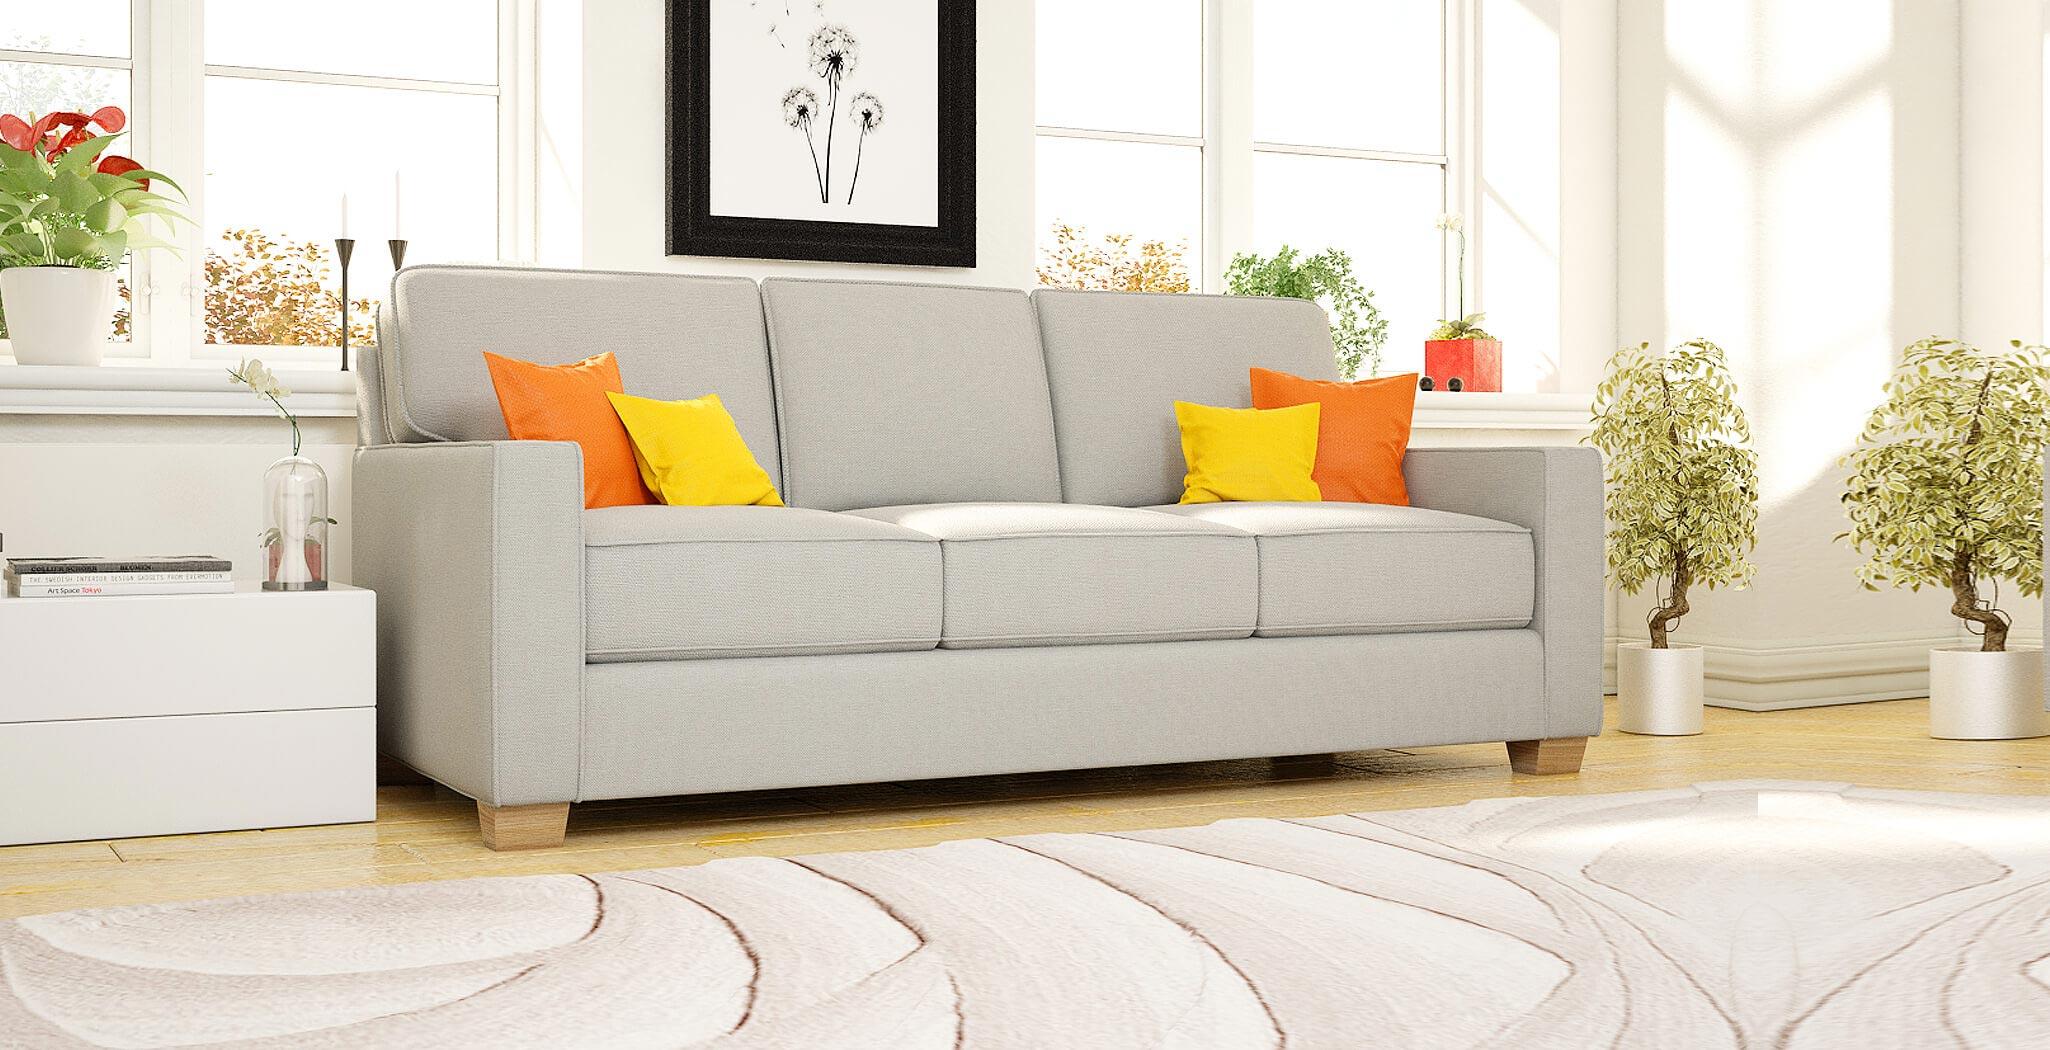 chicago sofa furniture gallery 2